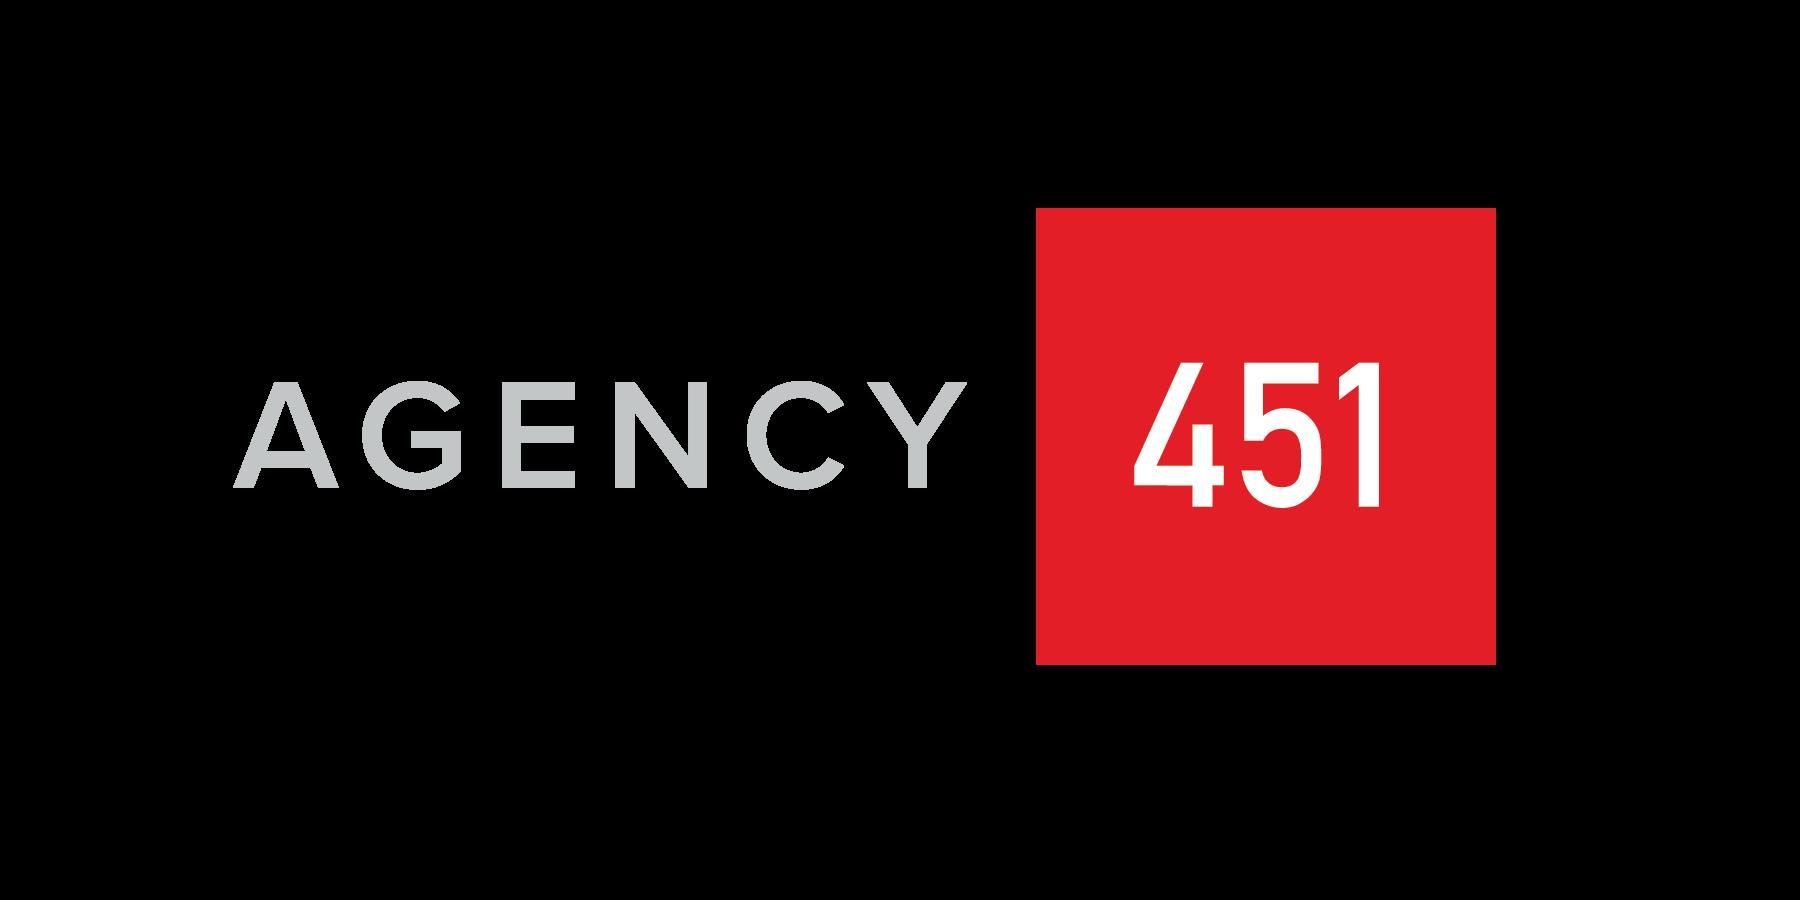 Agency 451